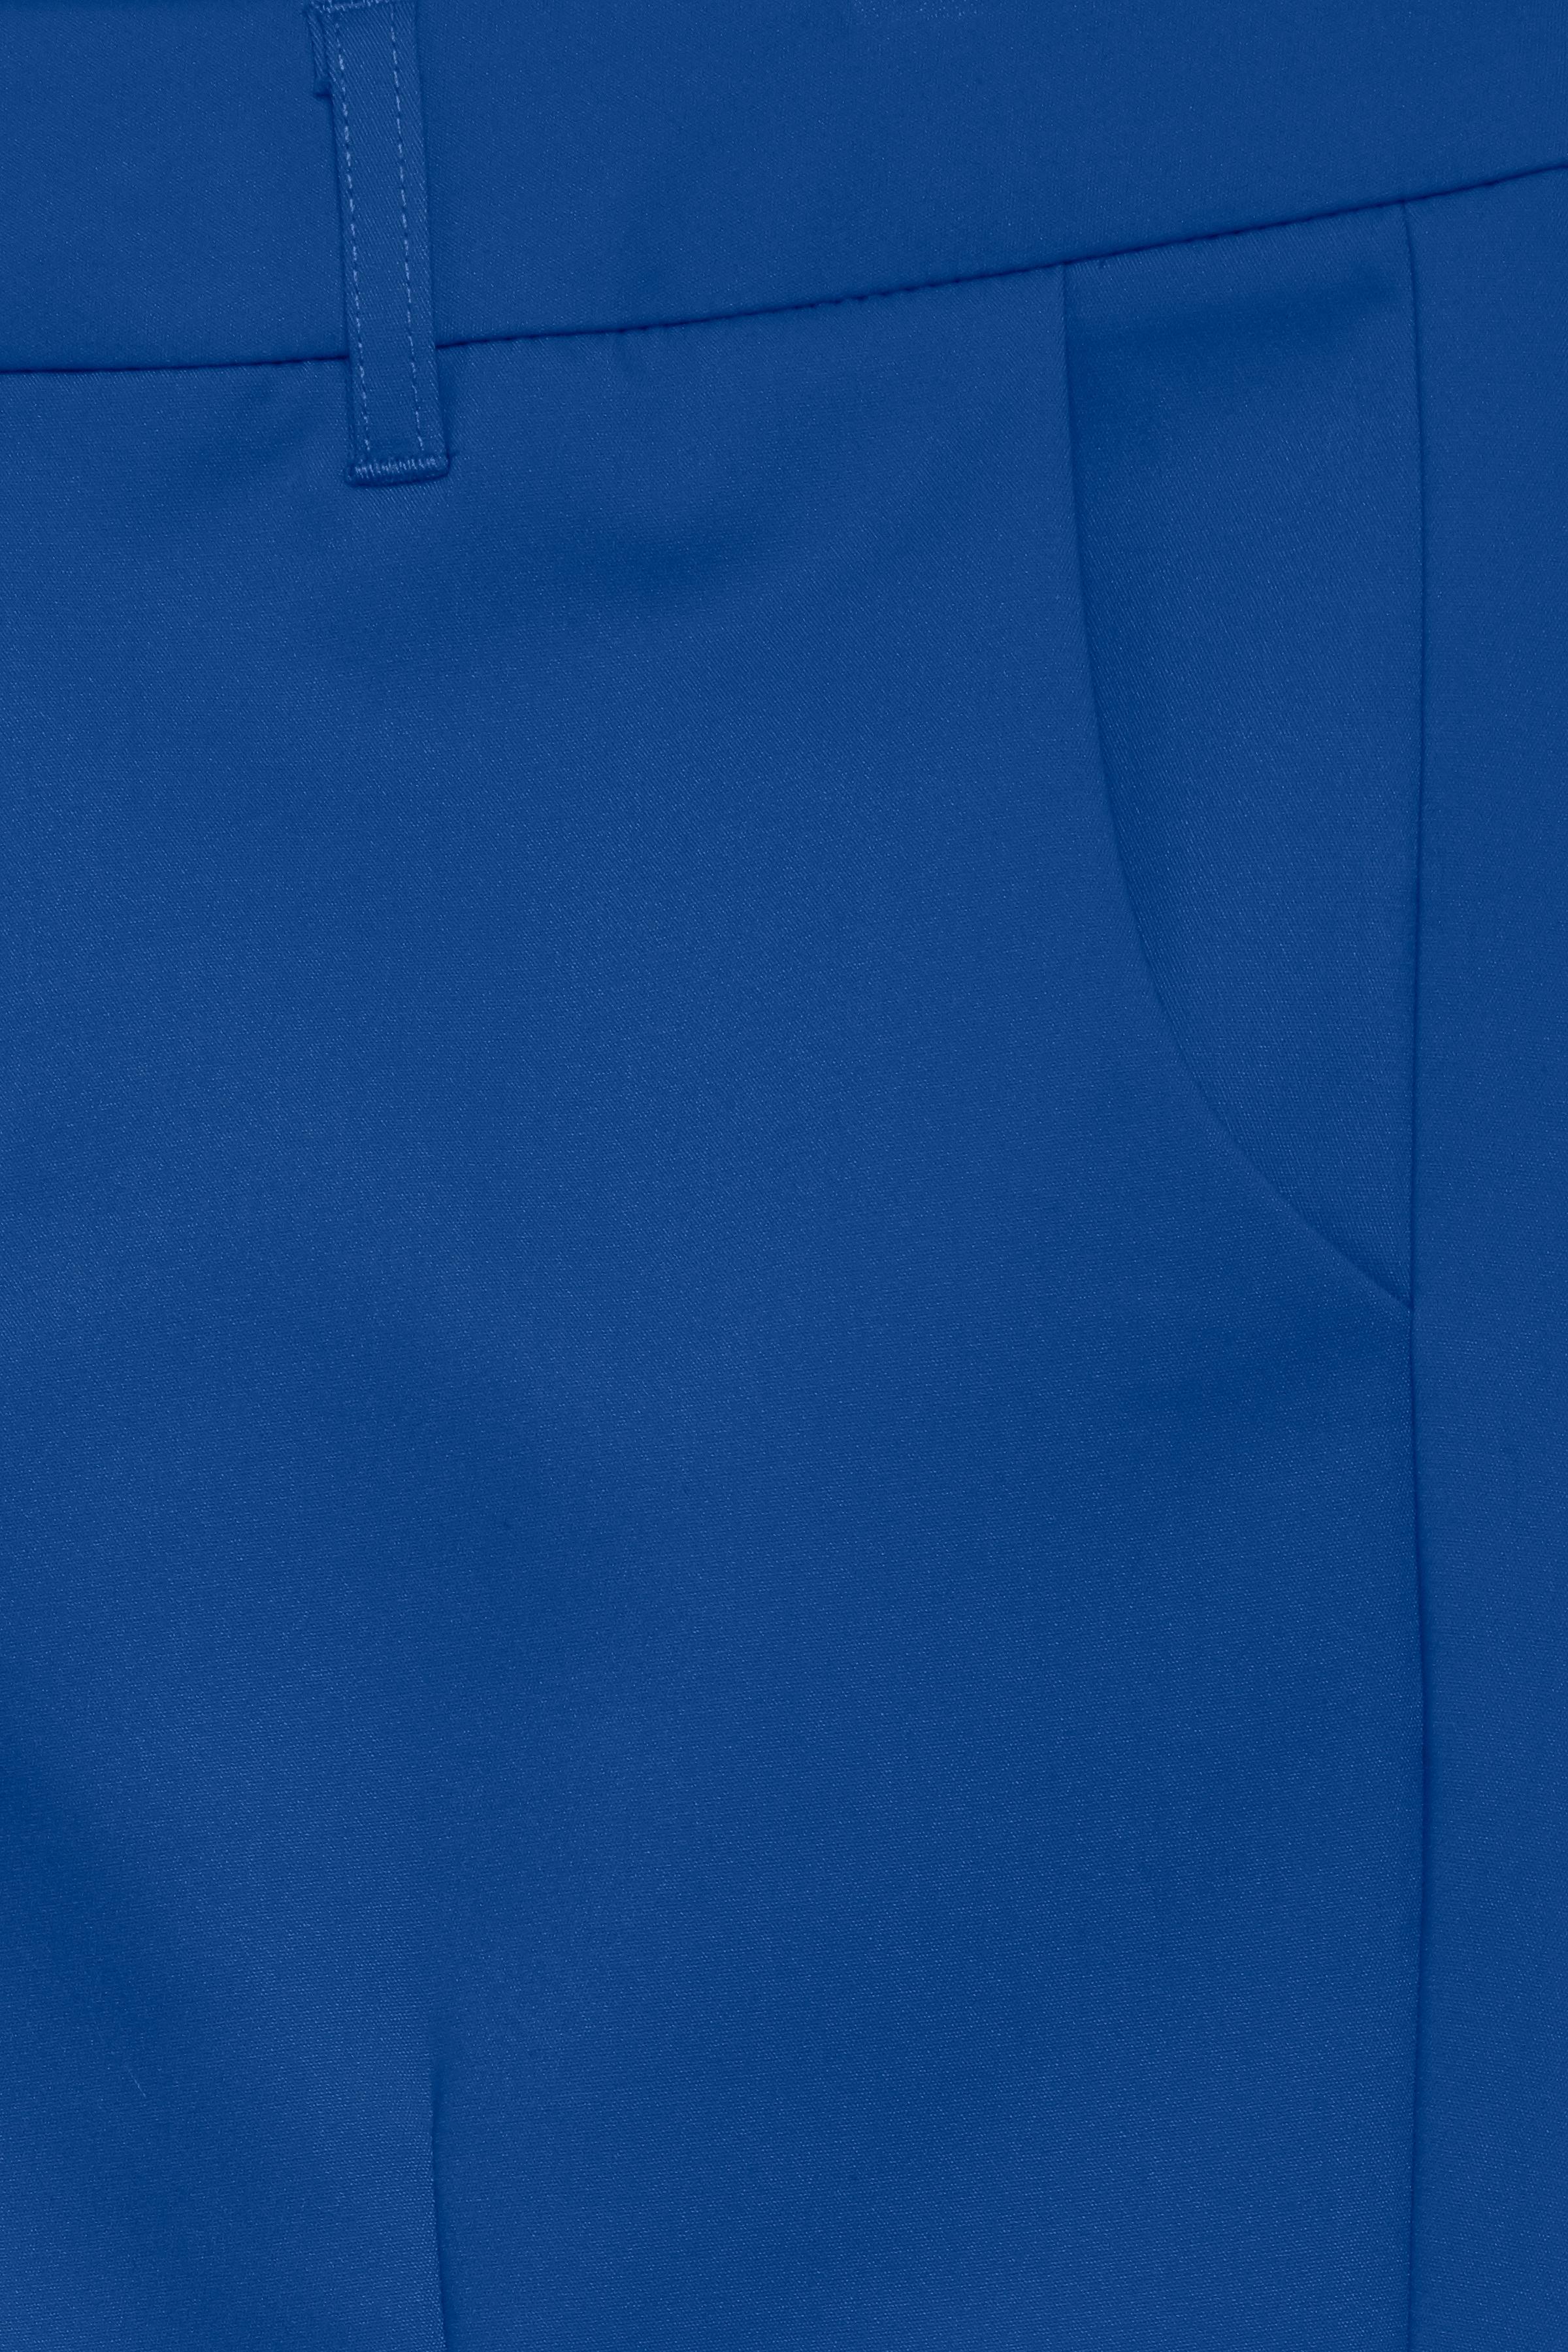 Twilight Blue Casual bukser fra Pulz Jeans – Køb Twilight Blue Casual bukser fra str. 32-46 her